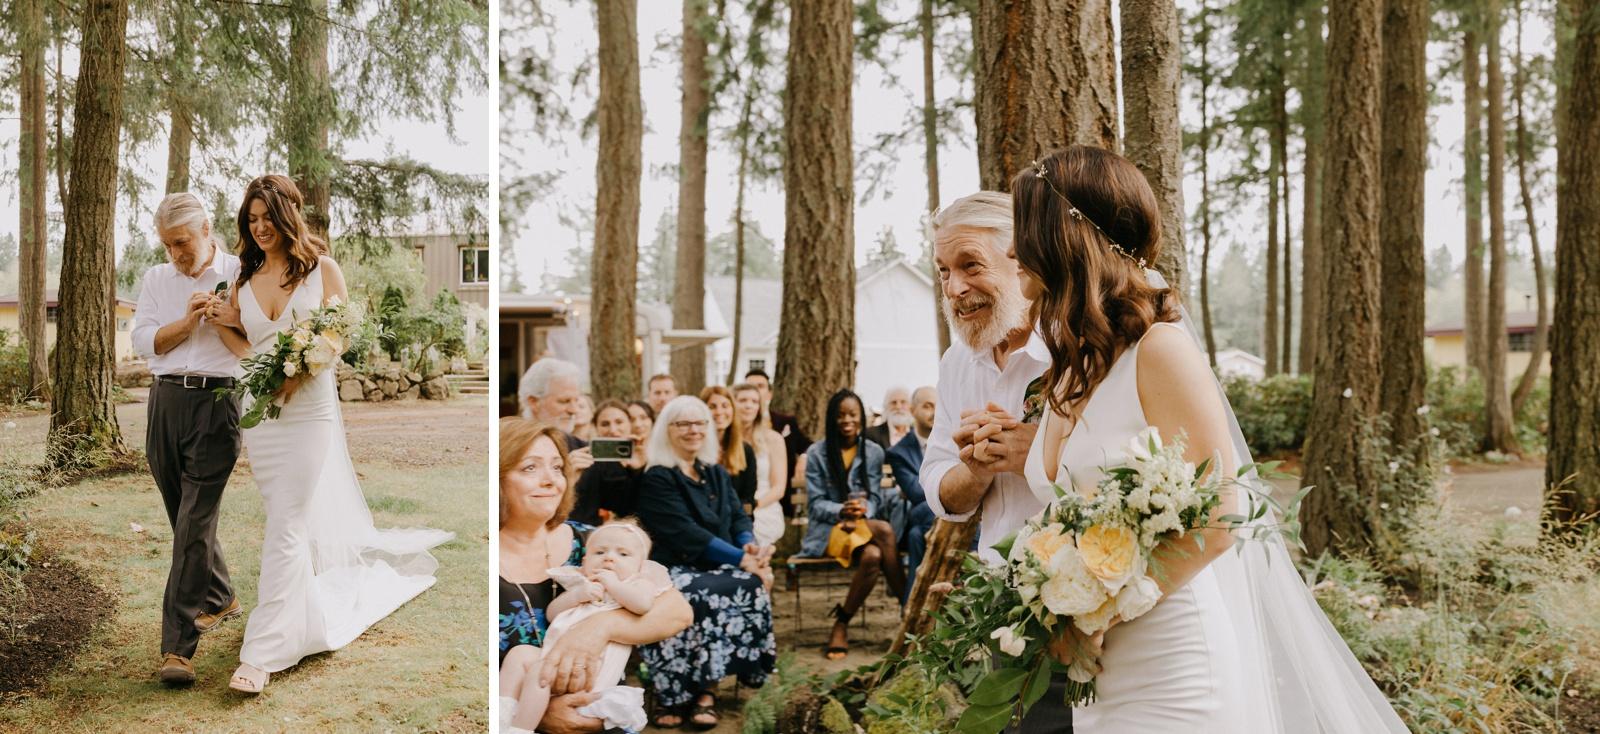 Matthew and Autumn Intimate Outdoor Backyard Wedding_0111